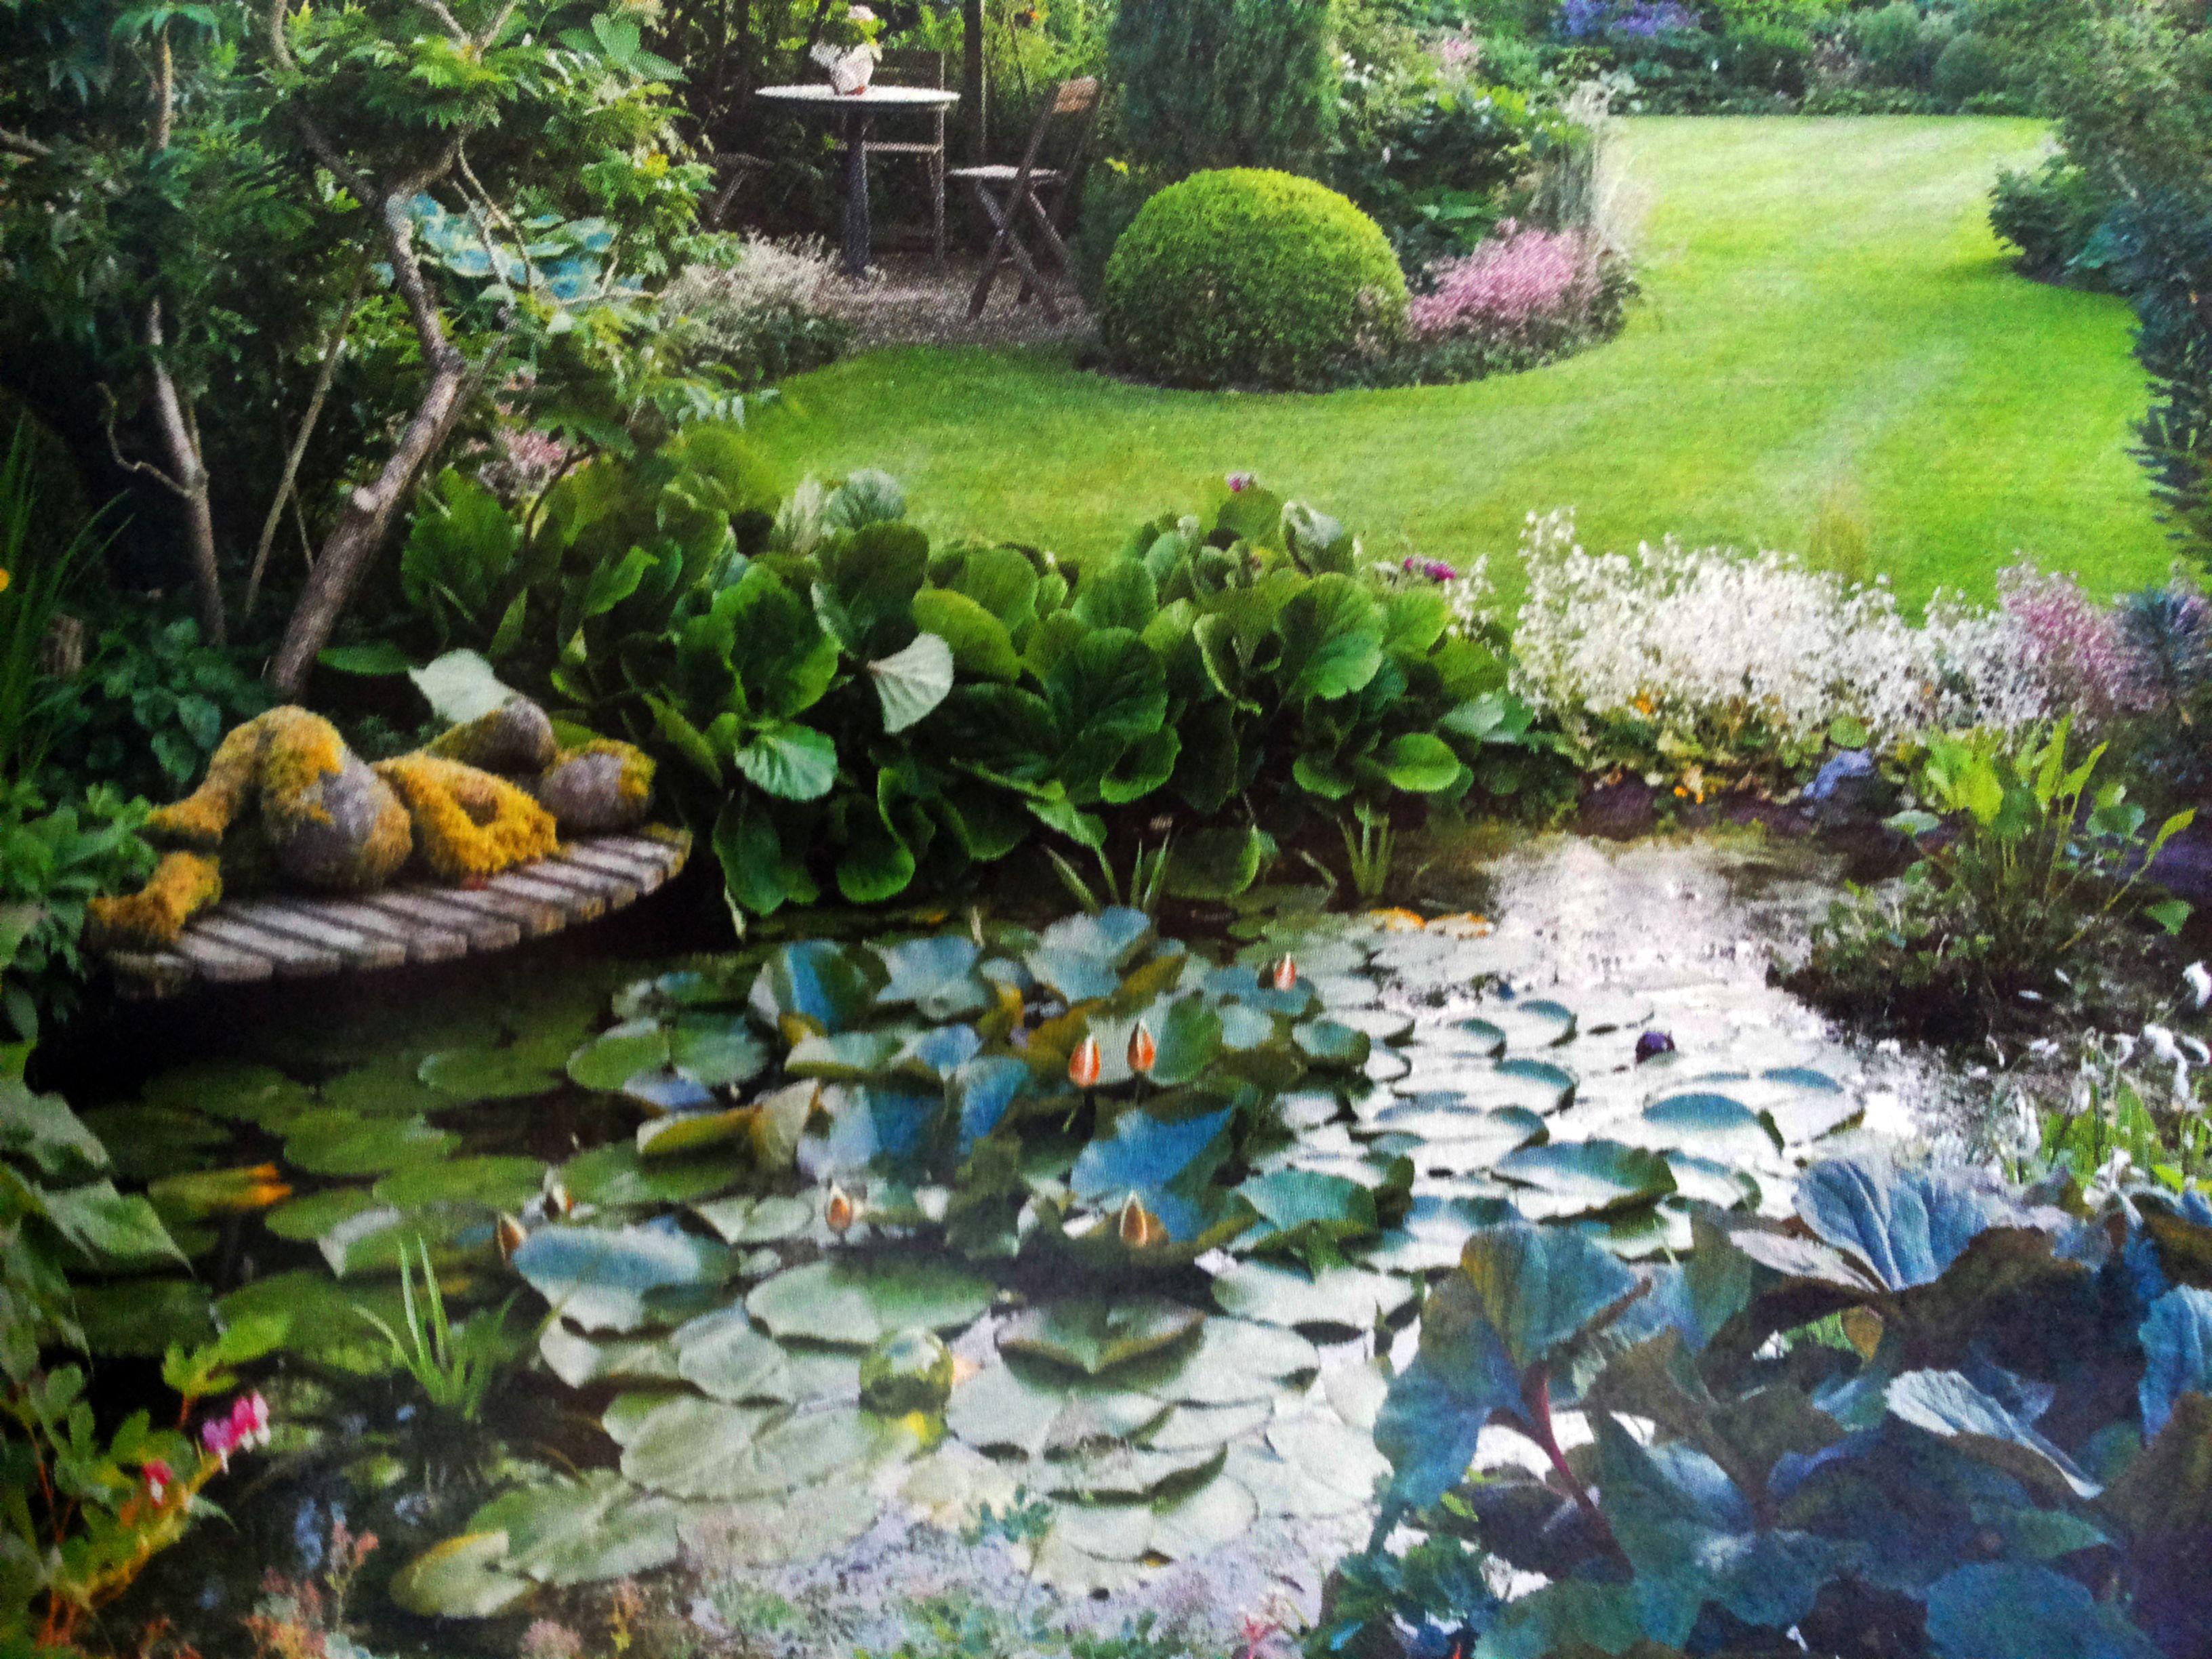 #Teich #Pond